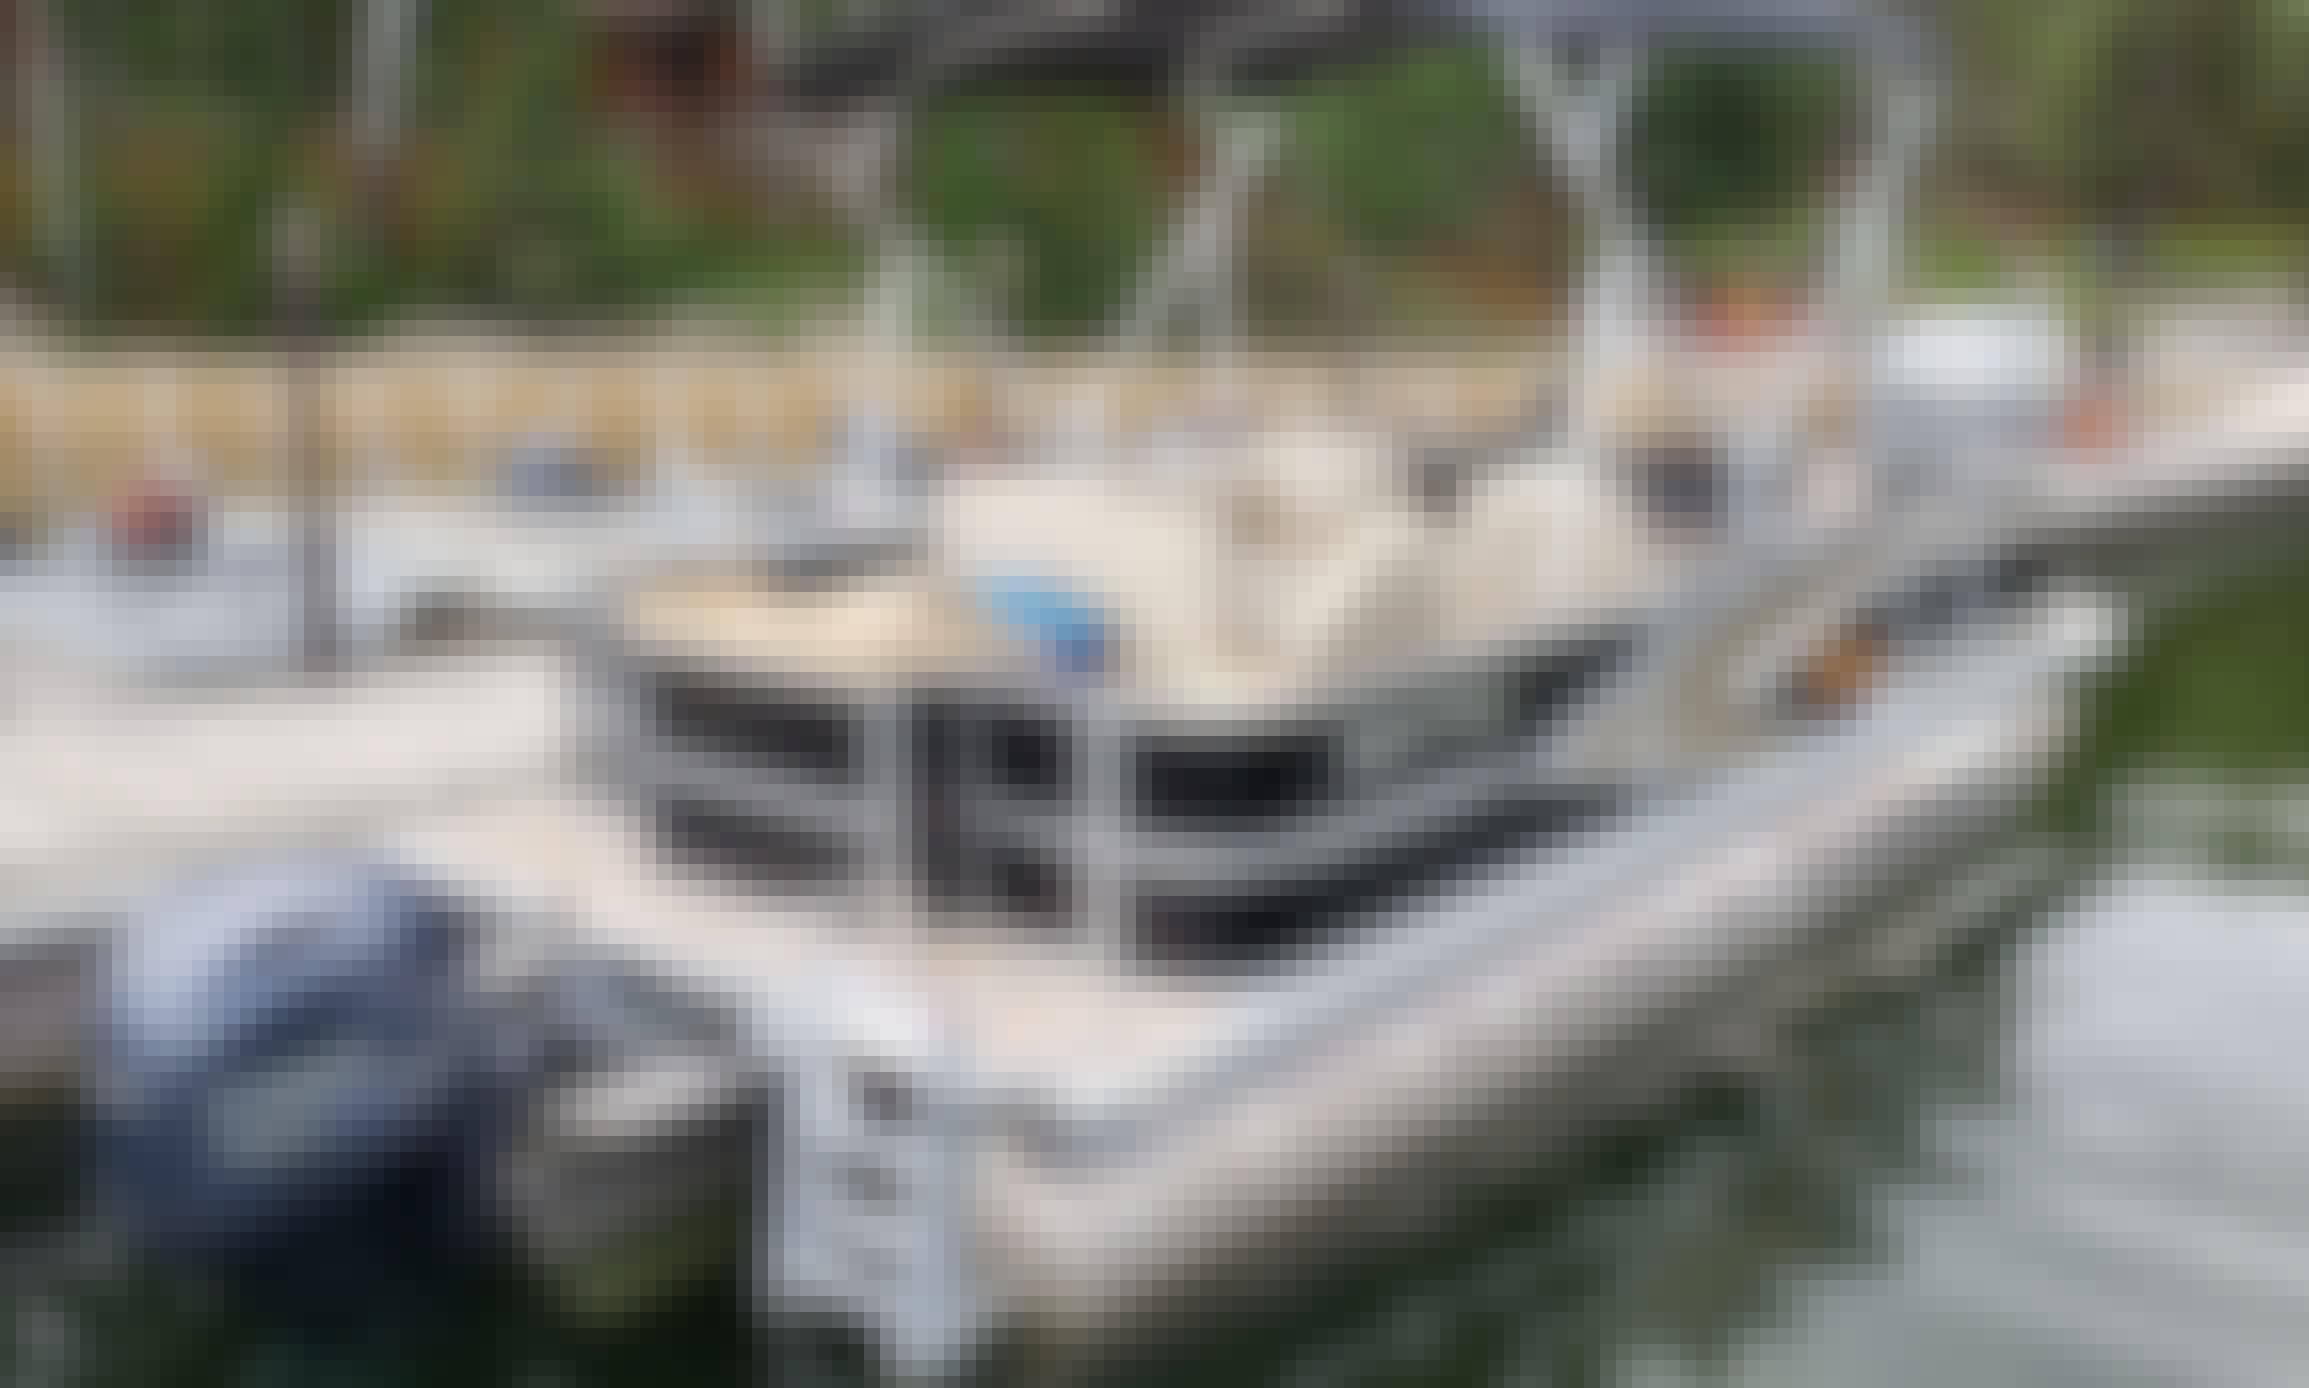 23' Lund Pontoon Rental on Lake of the Woods, Ontario, Canada